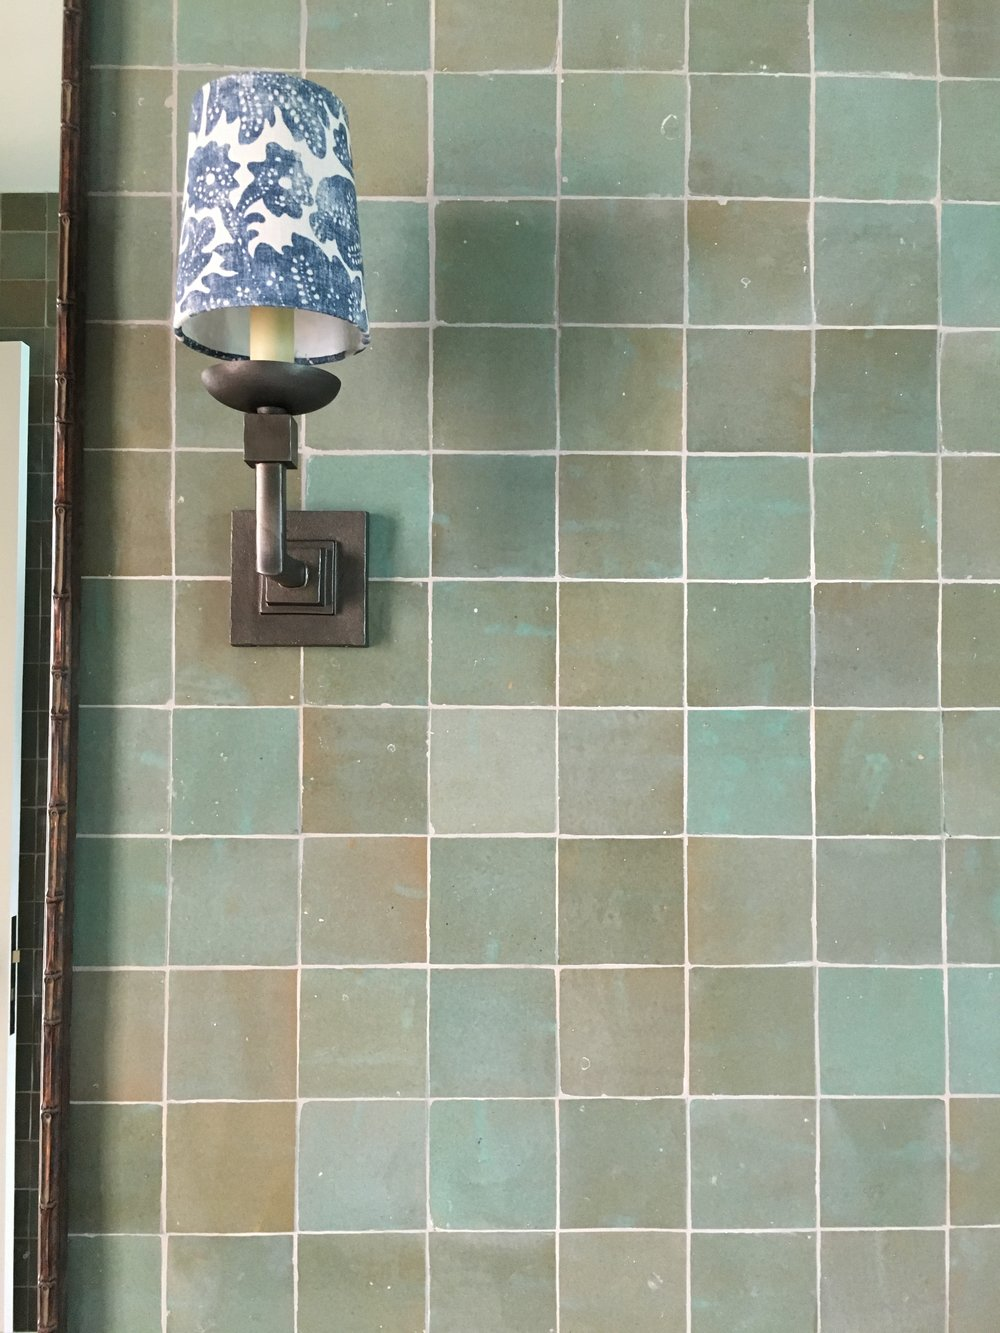 Tilesofezra Moroccan Bathroom tile Aqua ZEL001B 3.JPG